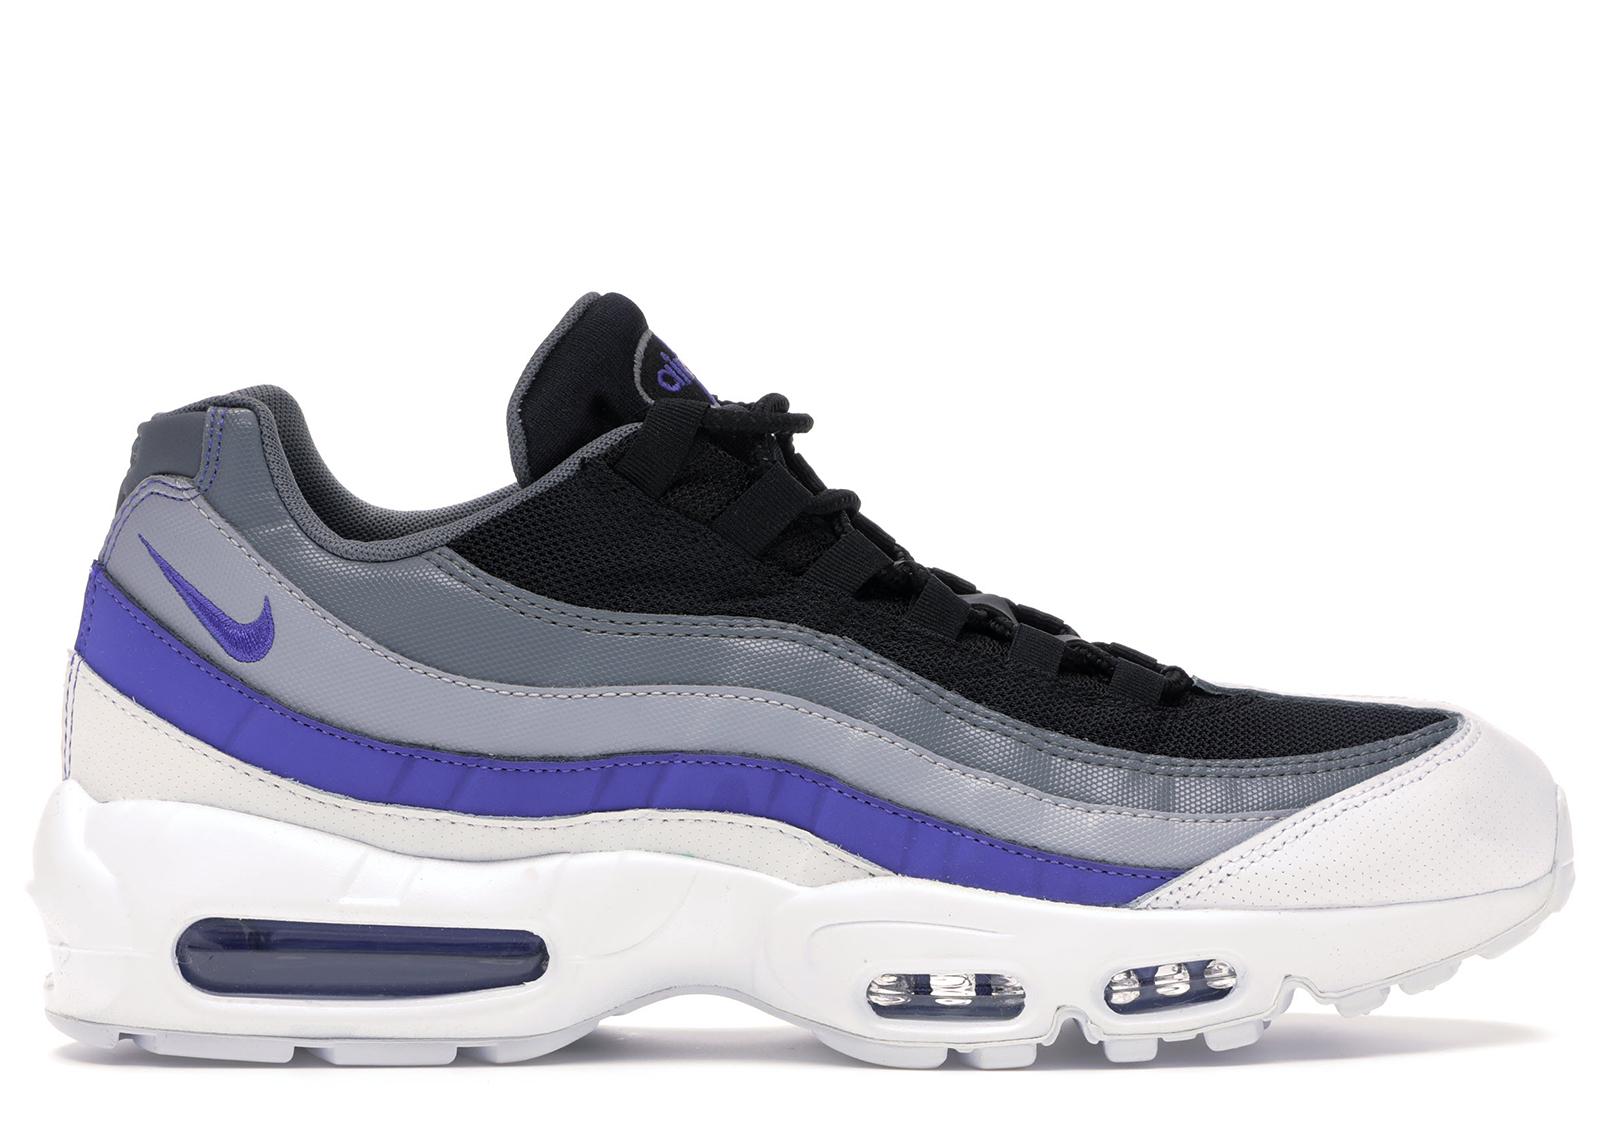 air max 95 persian violet